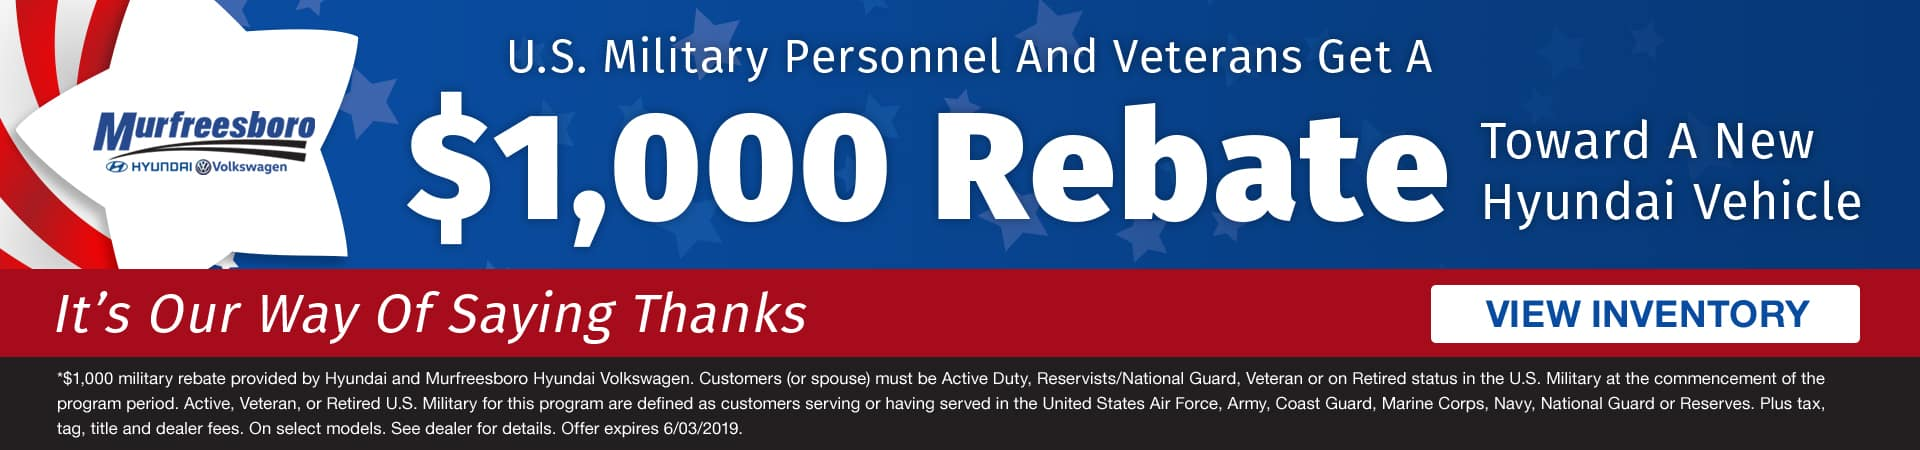 U.S. military personnel and veterans get a $1,000 rebate toward a new Hyundai in Murfreesboro TN